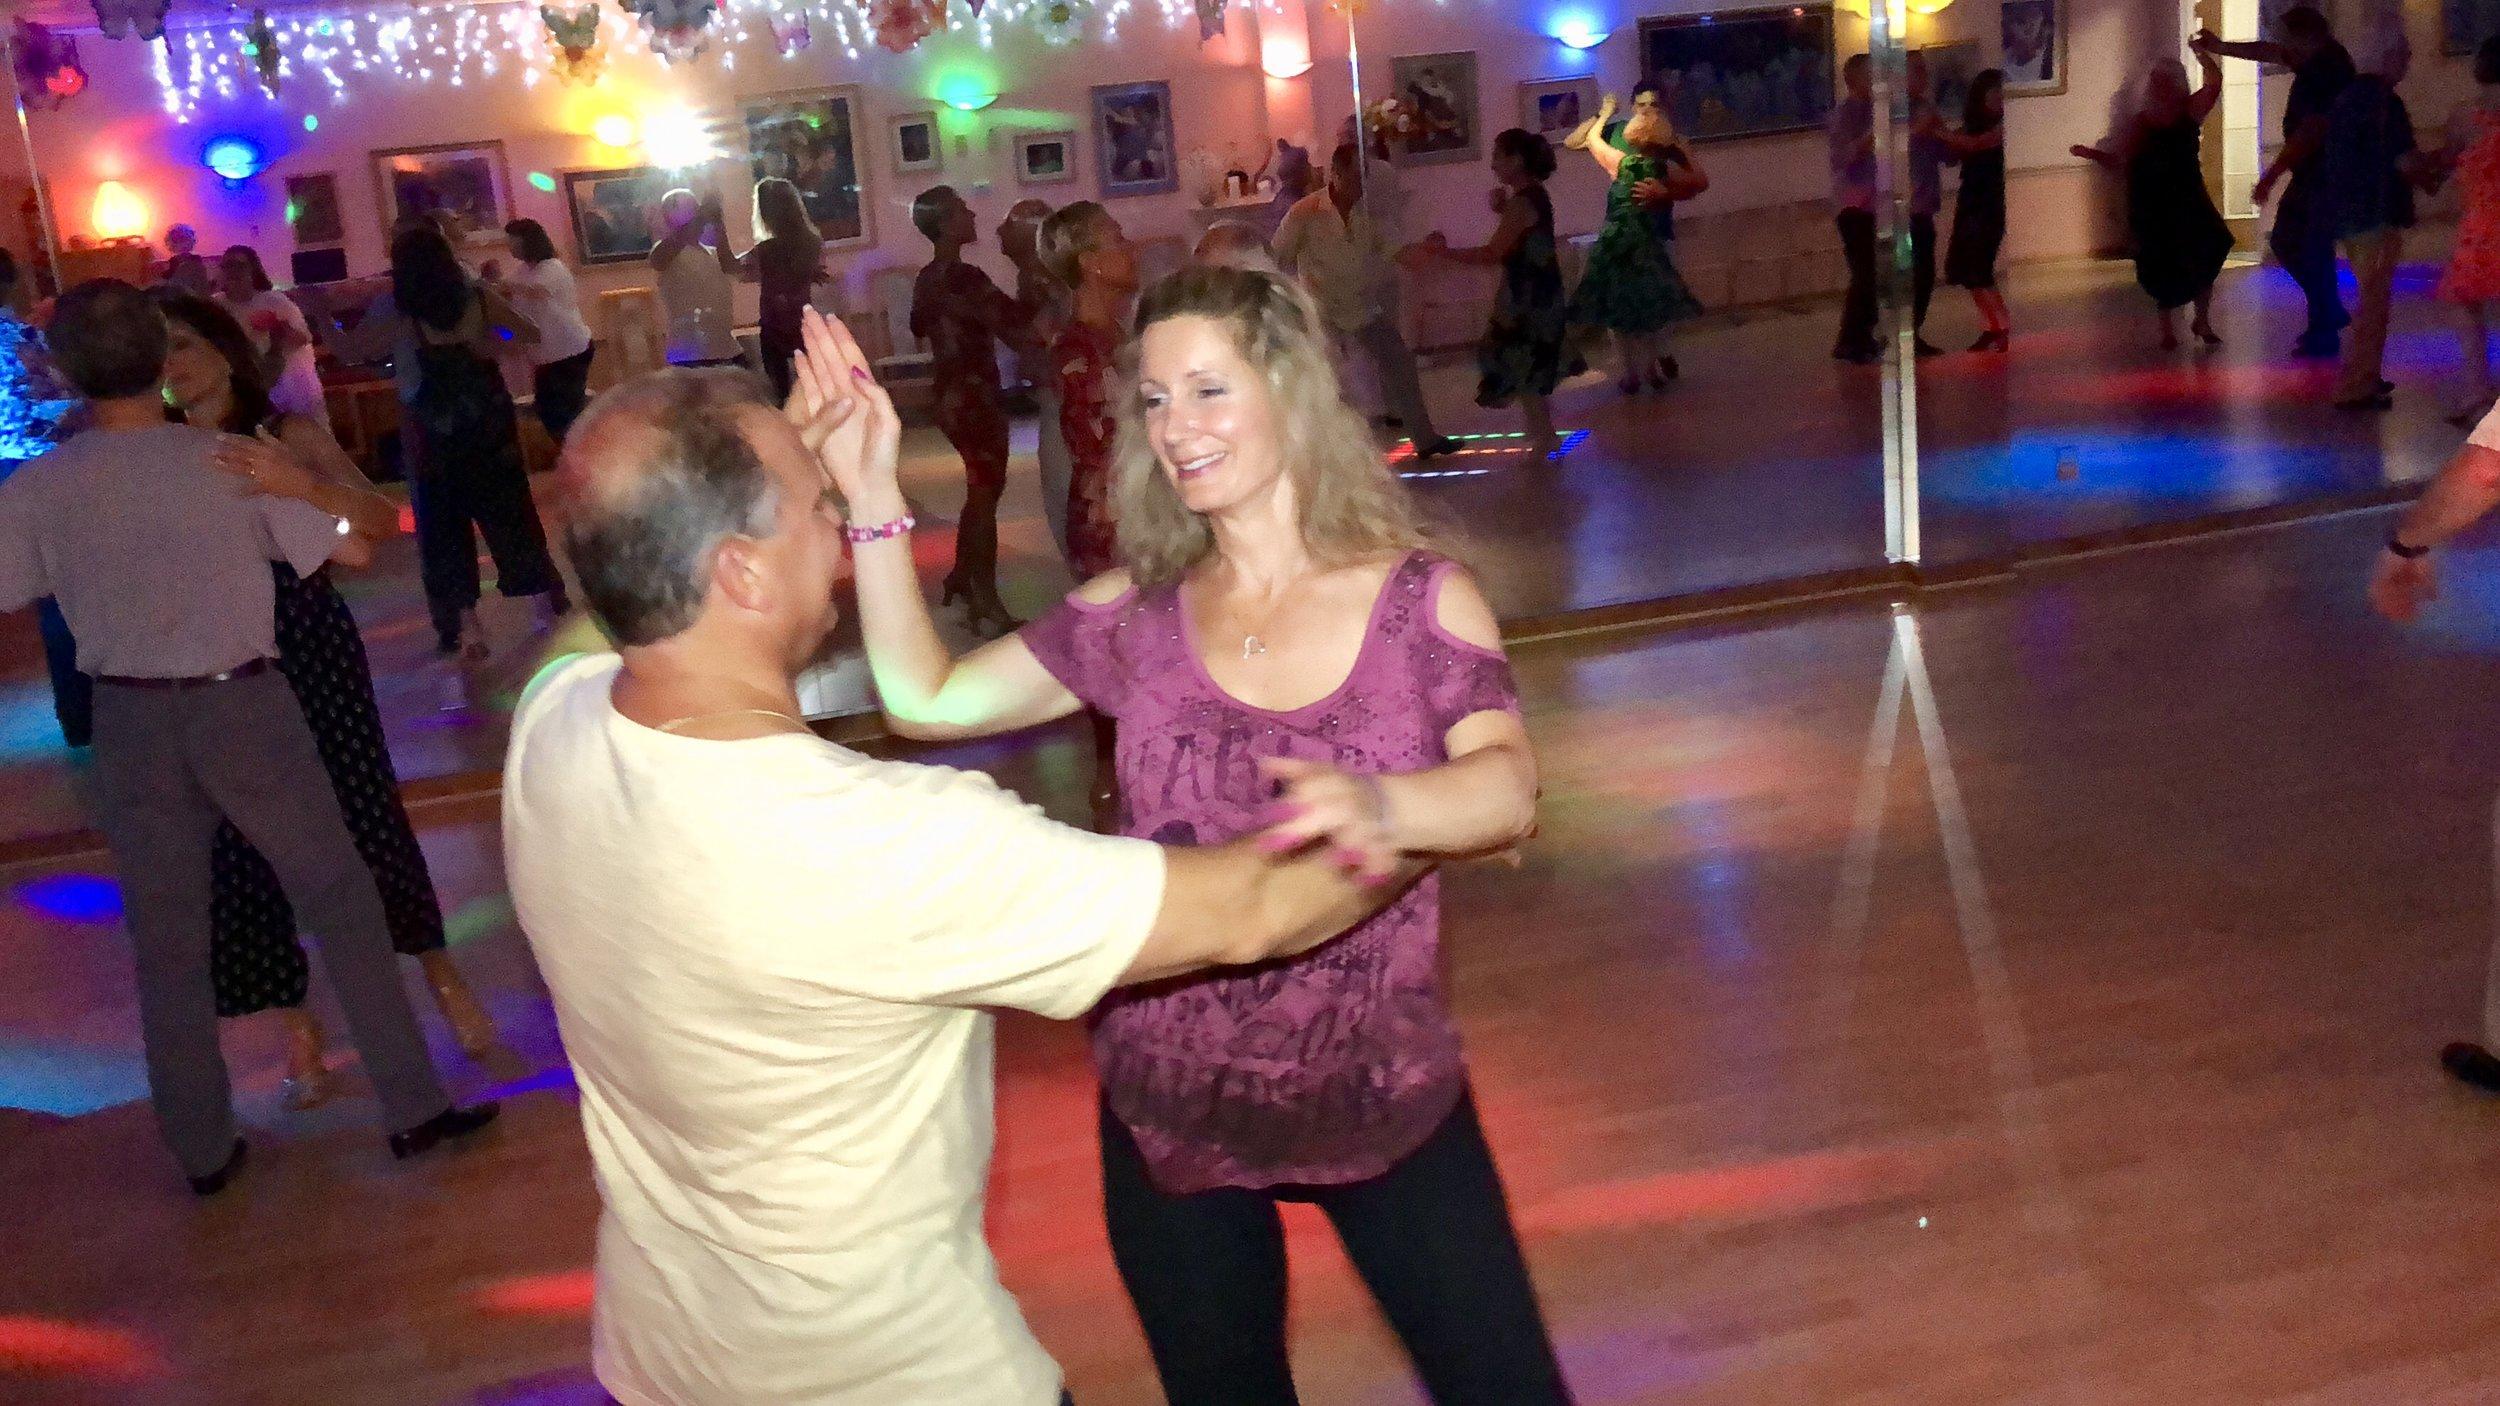 Couples Ballroom Dancing at Quick Quick Slow Ballroom Dance Studio in Marlboro NJ